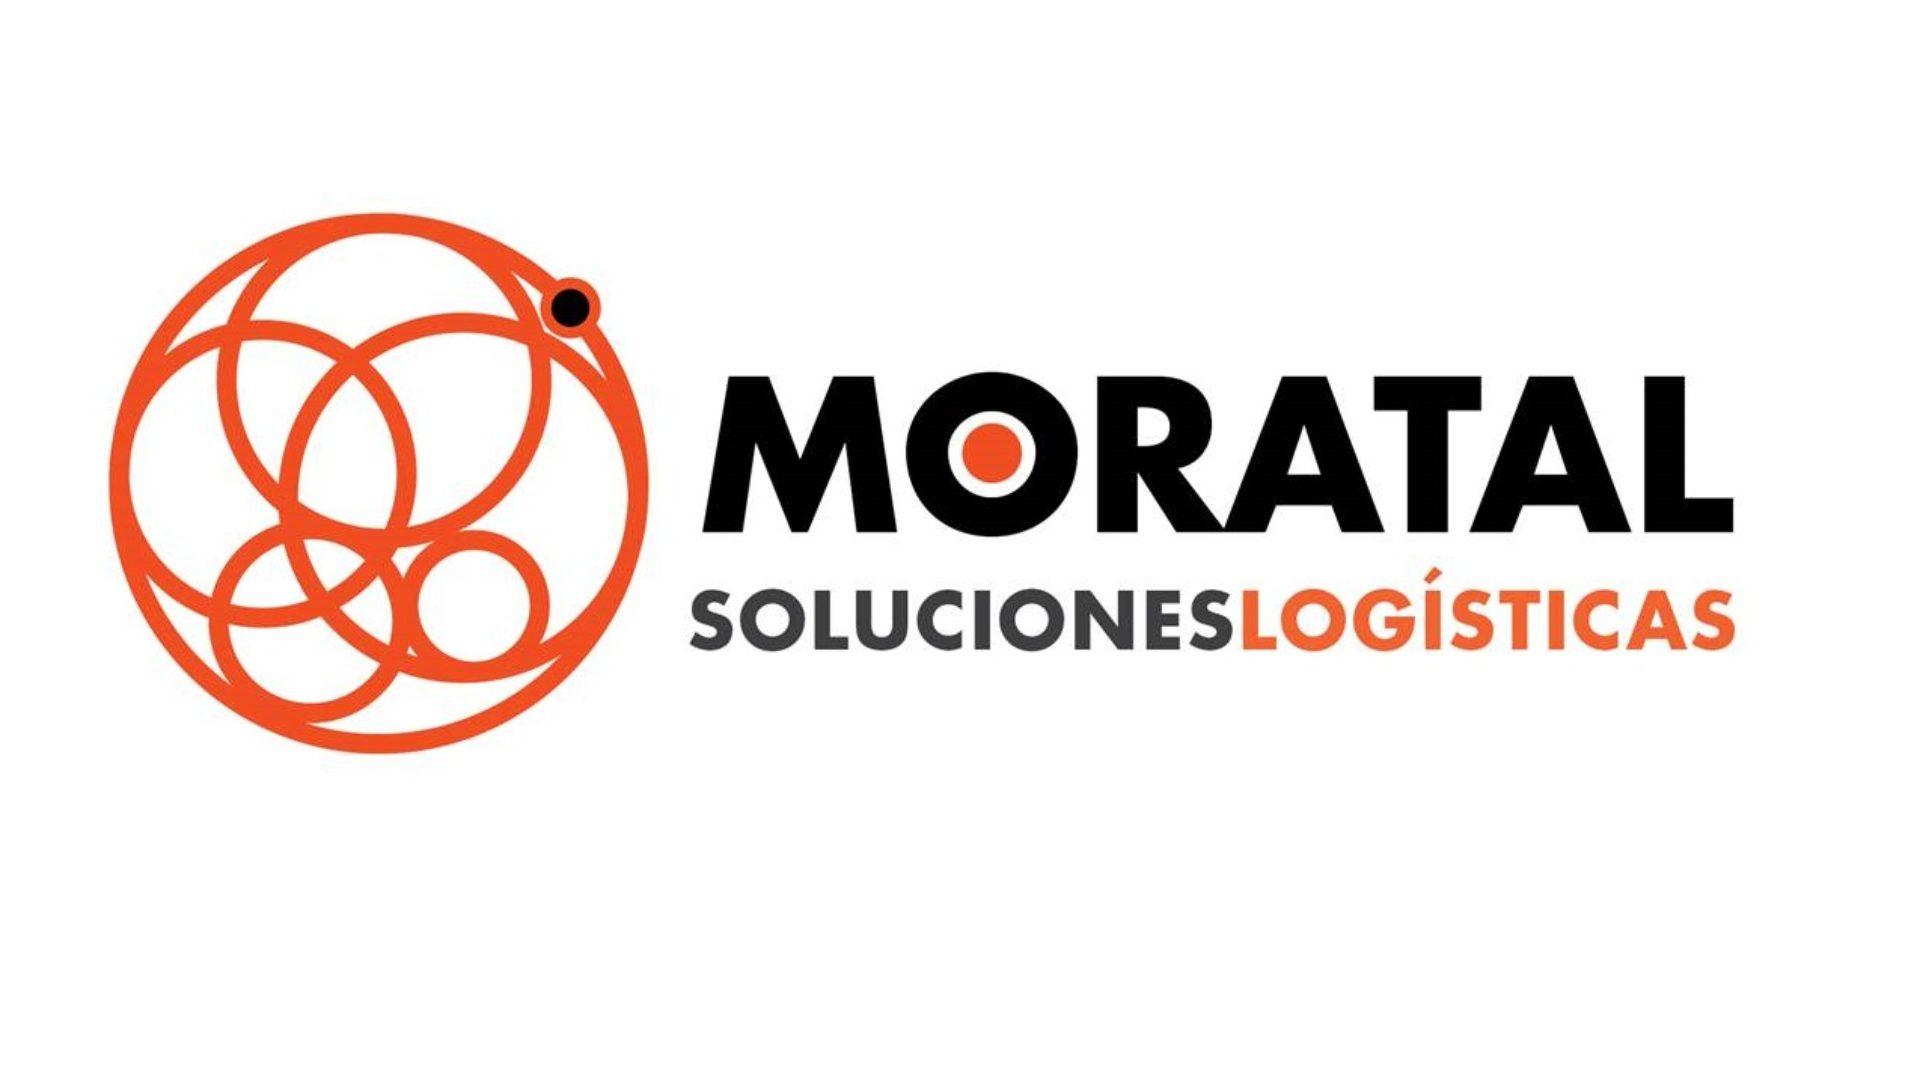 Moratal Soluciones Logisticas S.L.